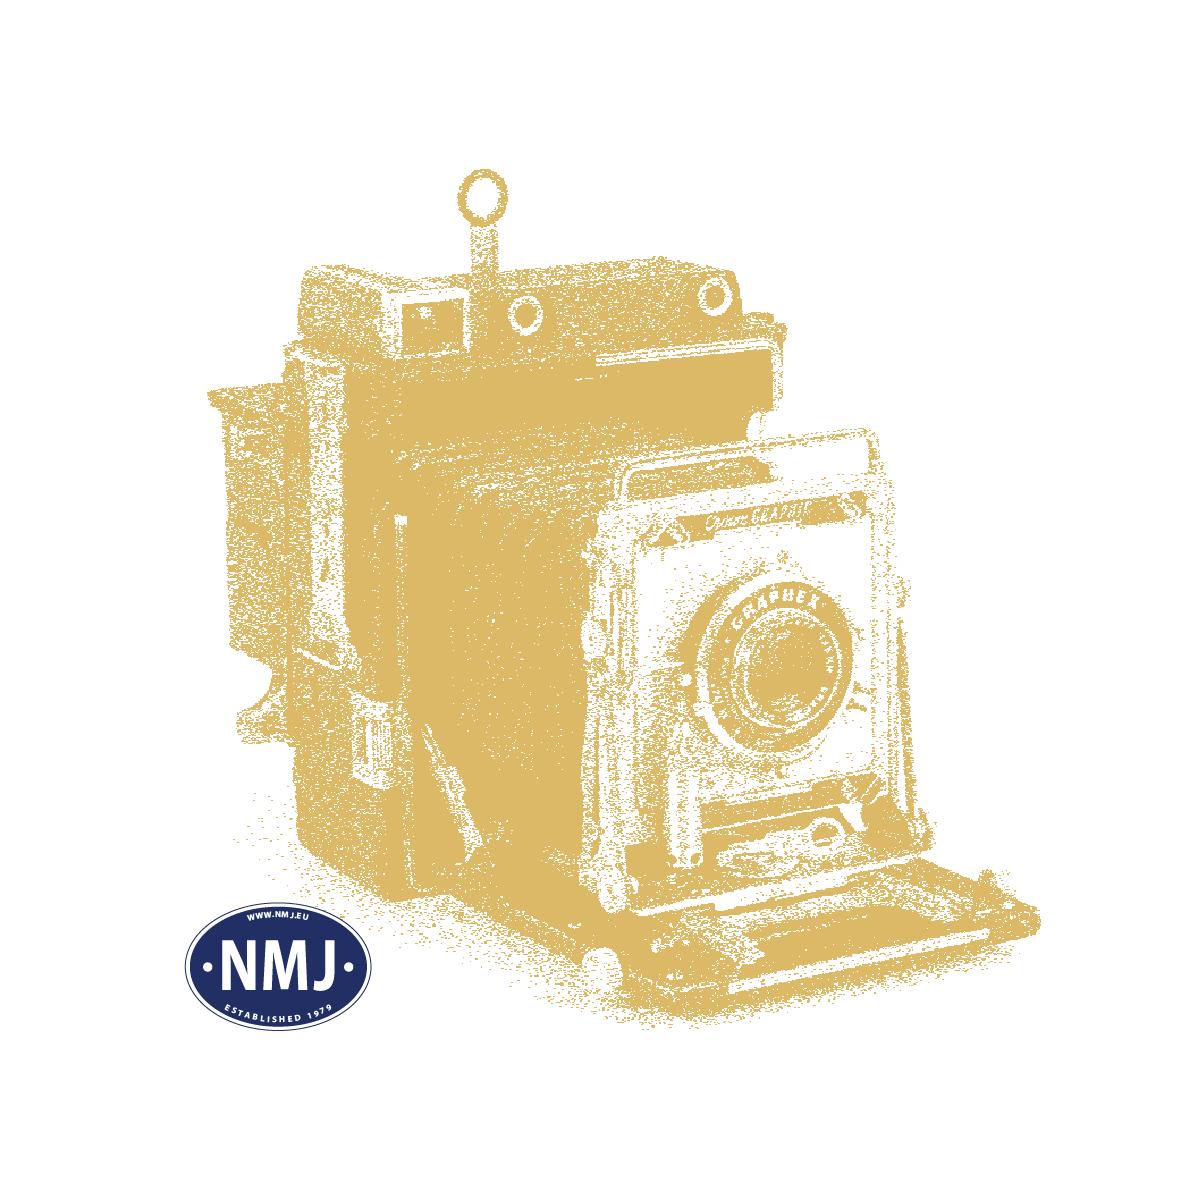 NOC15057 - Byggearbeidere